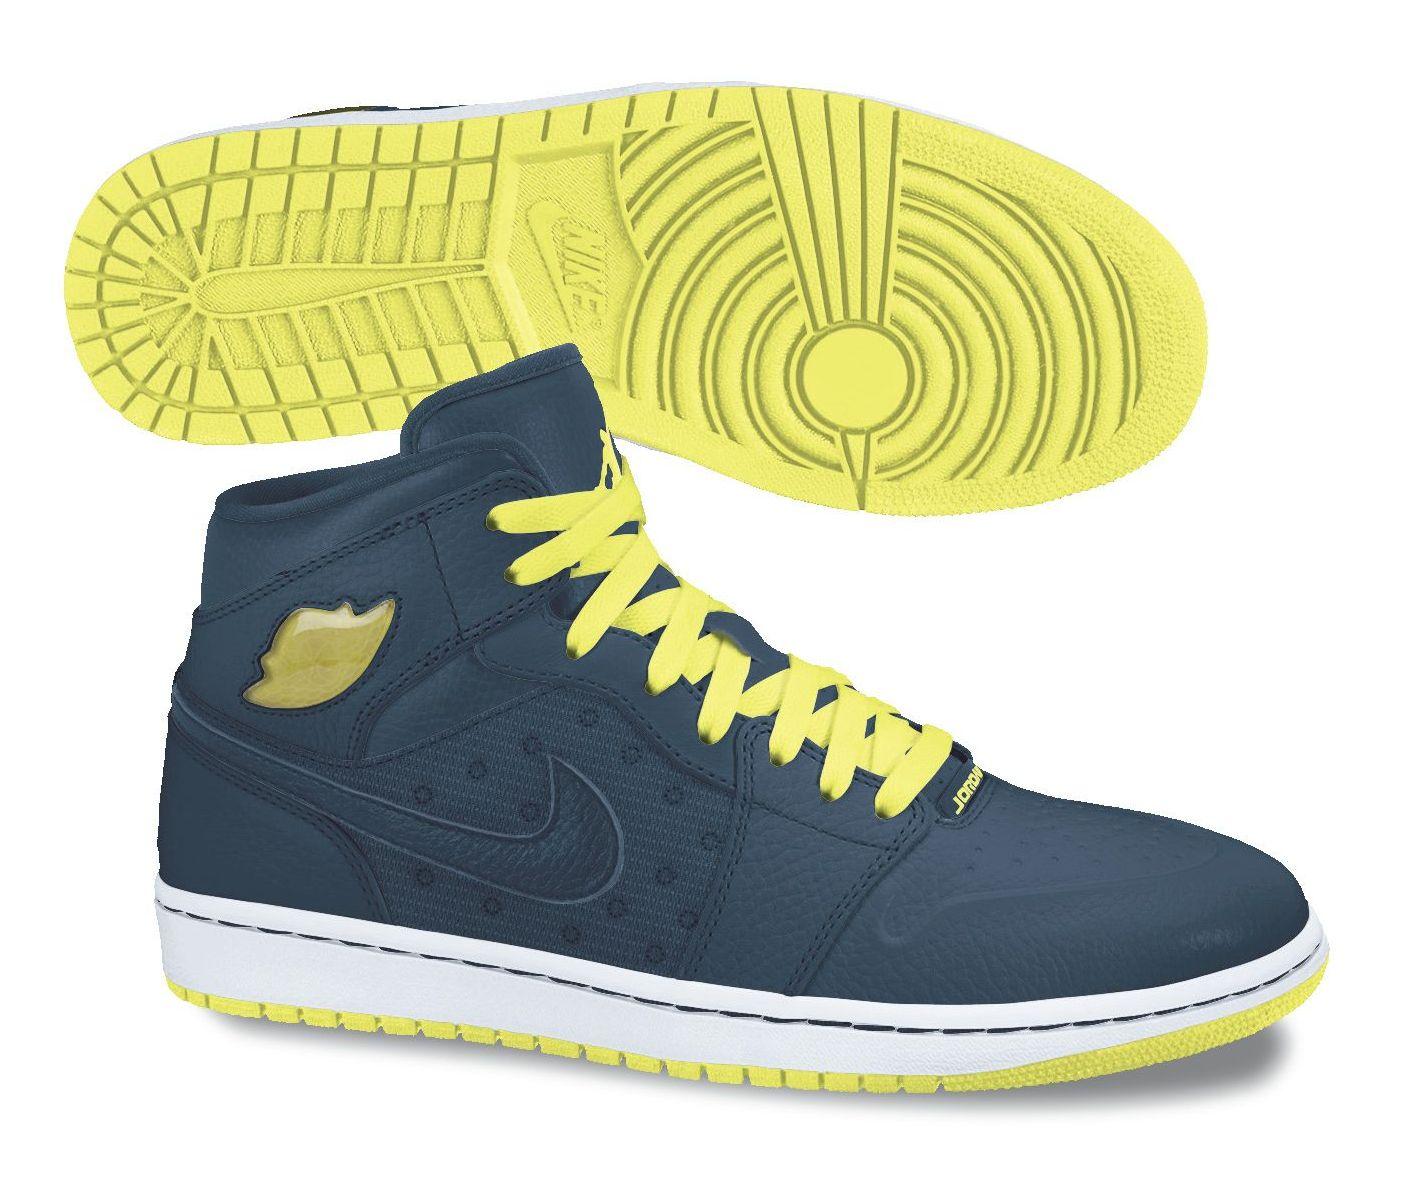 "Air Jordan 1 Retro  97 TXT  ""Squadron Blue"" - Air Jordans fc41e8b26d72"